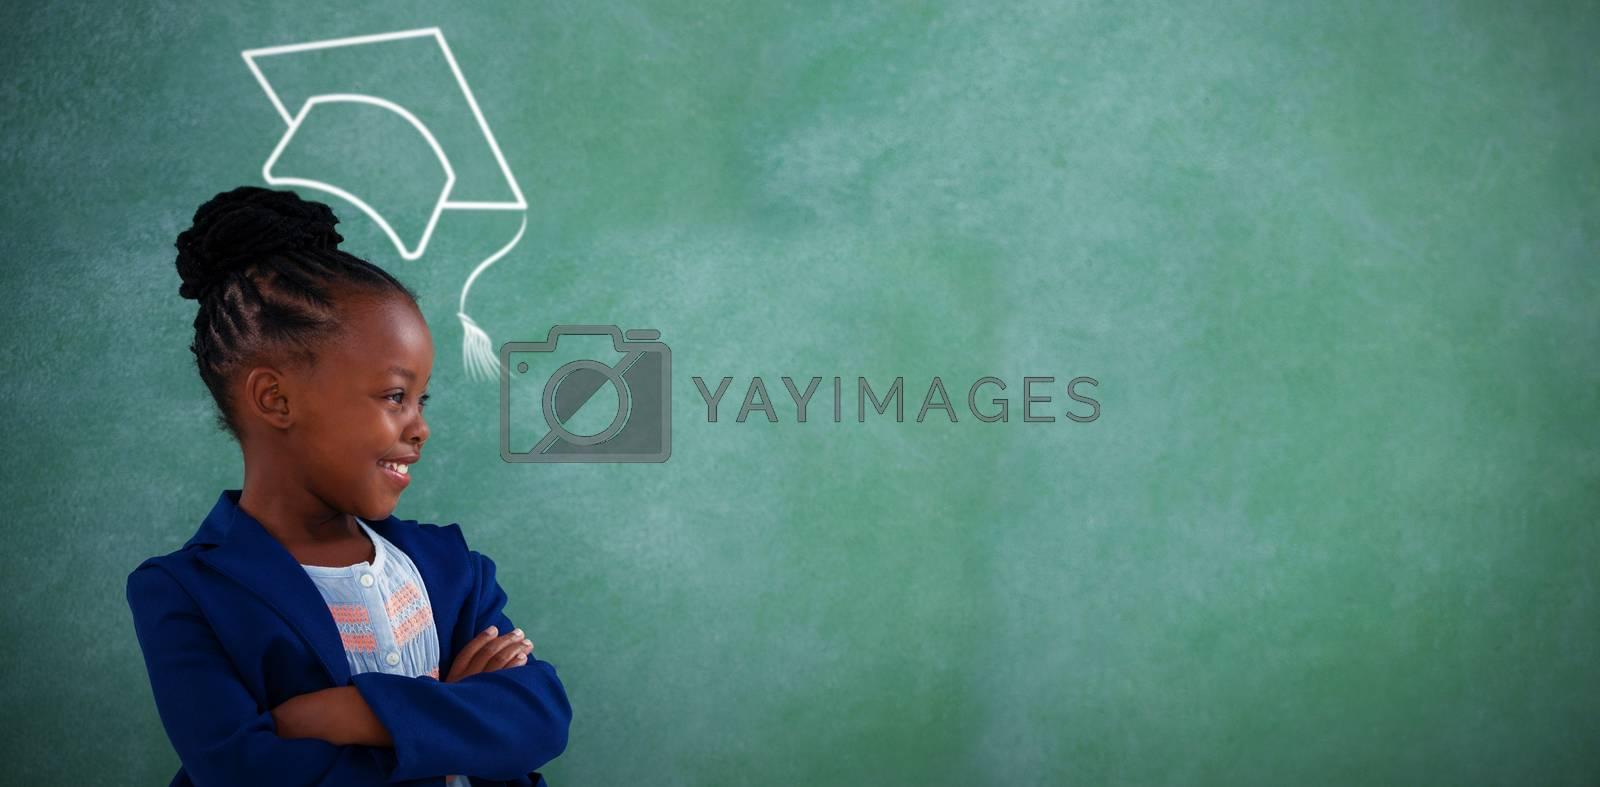 Composite image of graduation hat vector by Wavebreakmedia